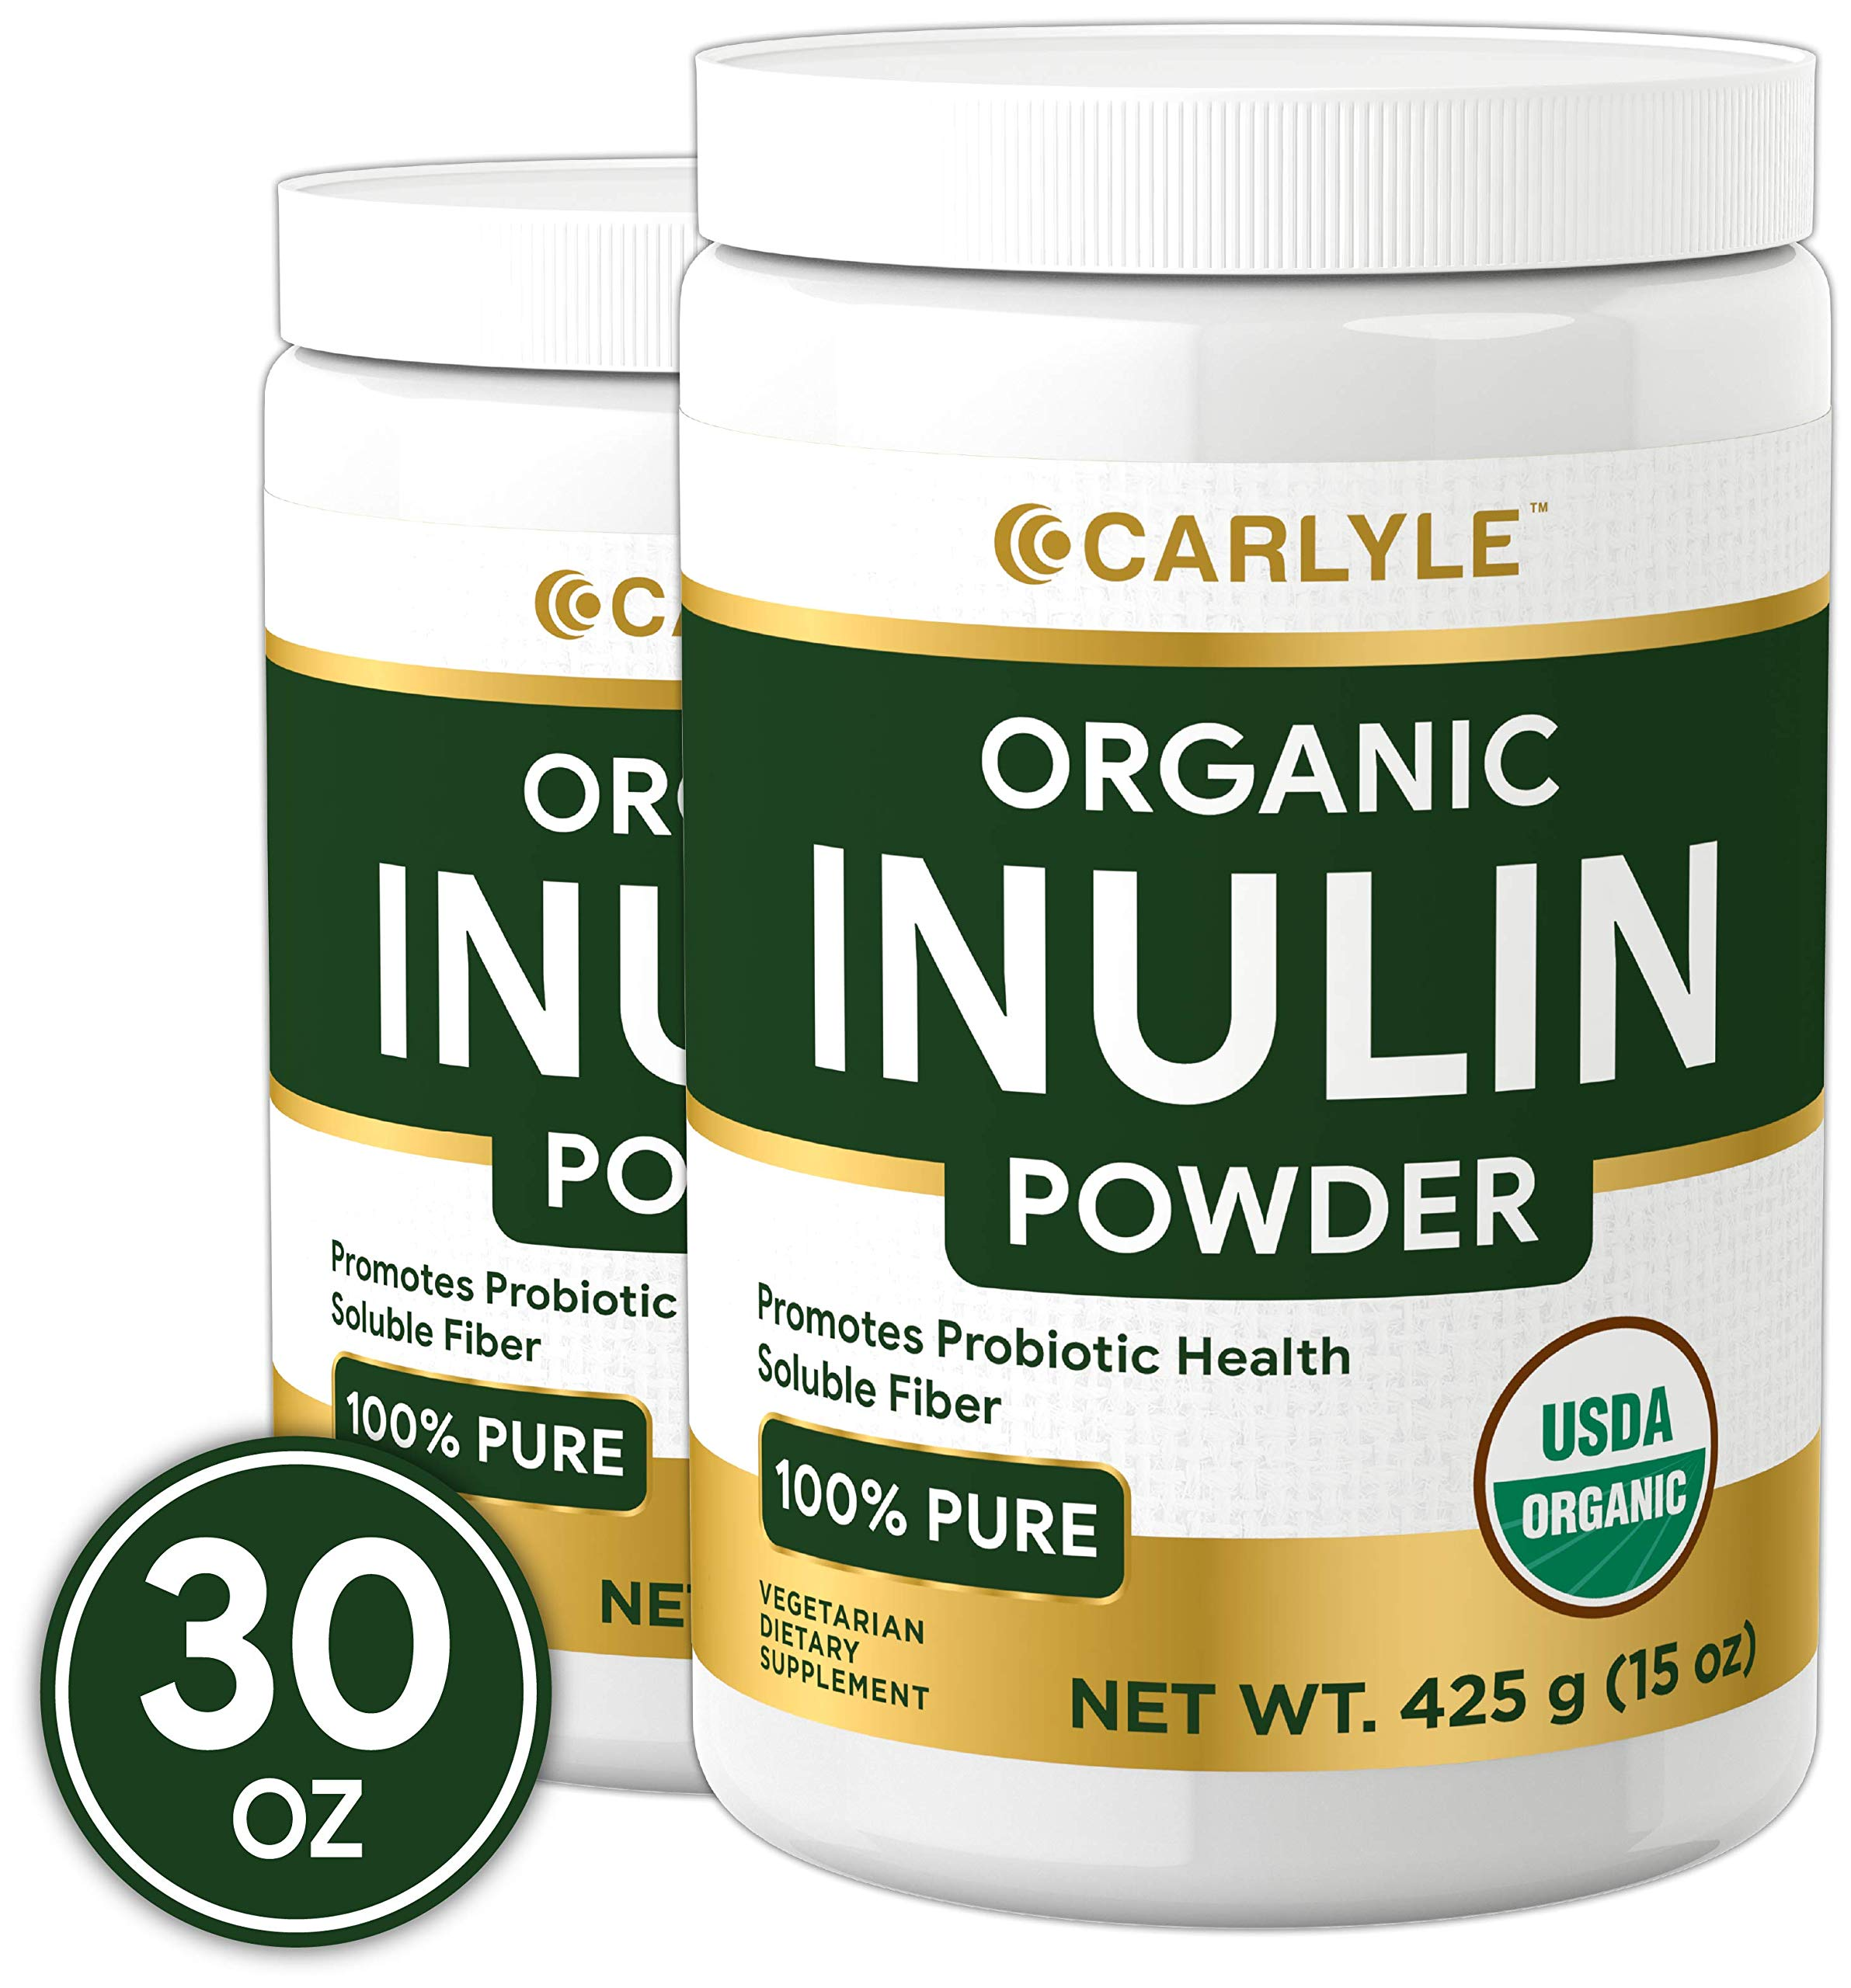 Organic Inulin Powder | 2 x 15 oz Pack | Vegetarian, Non-GMO, Gluten Free | Prebiotic FOS Fiber | Natural Sweetener | from Jerusalem Artichoke | by Carlyle by Carlyle